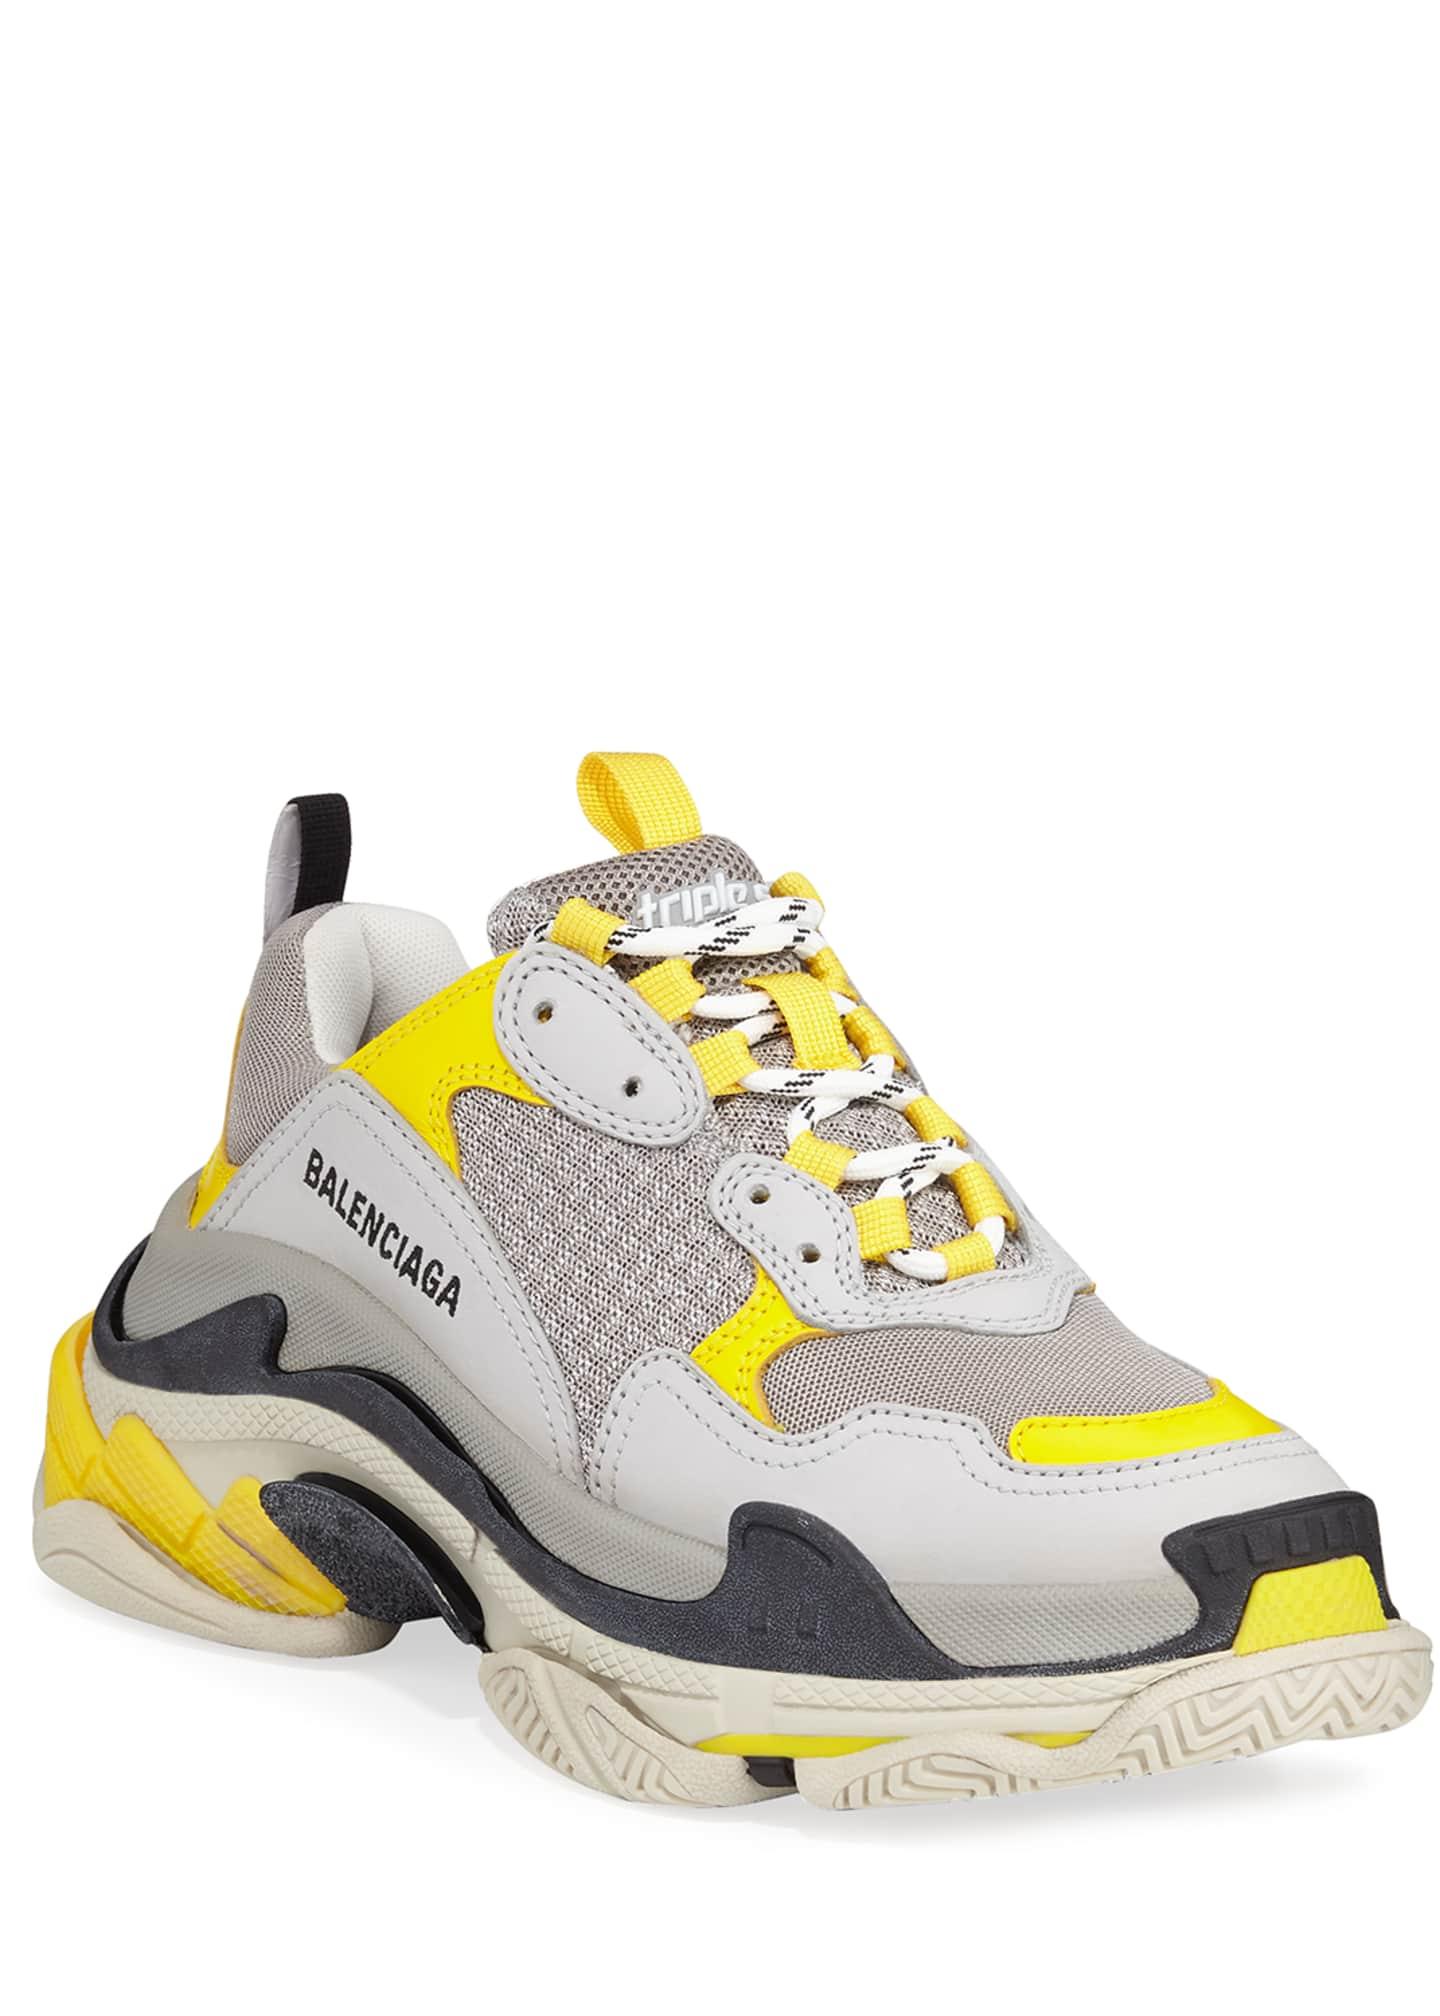 Balenciaga Triple S Fluo Mesh Trainer Sneakers